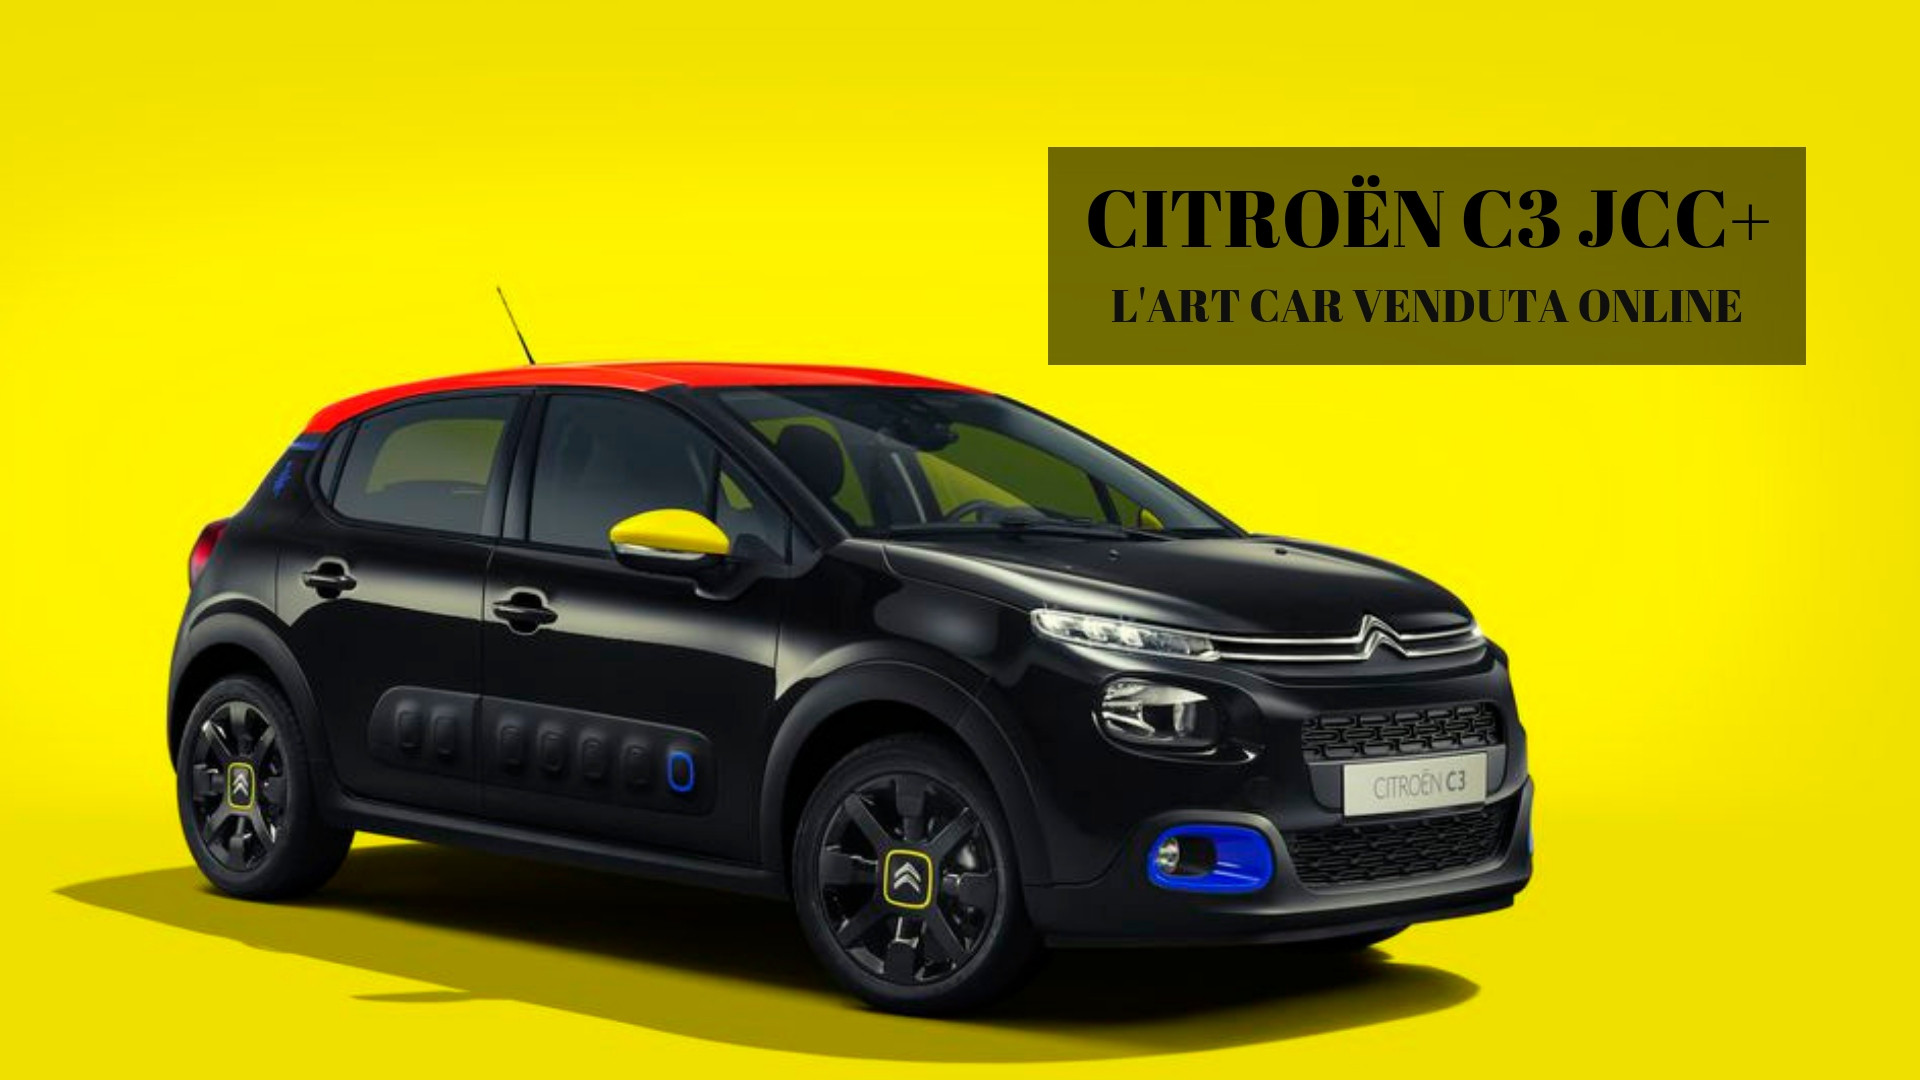 Citroën C3 JCC+,art car firmata Jean-Charles de Castelbajac